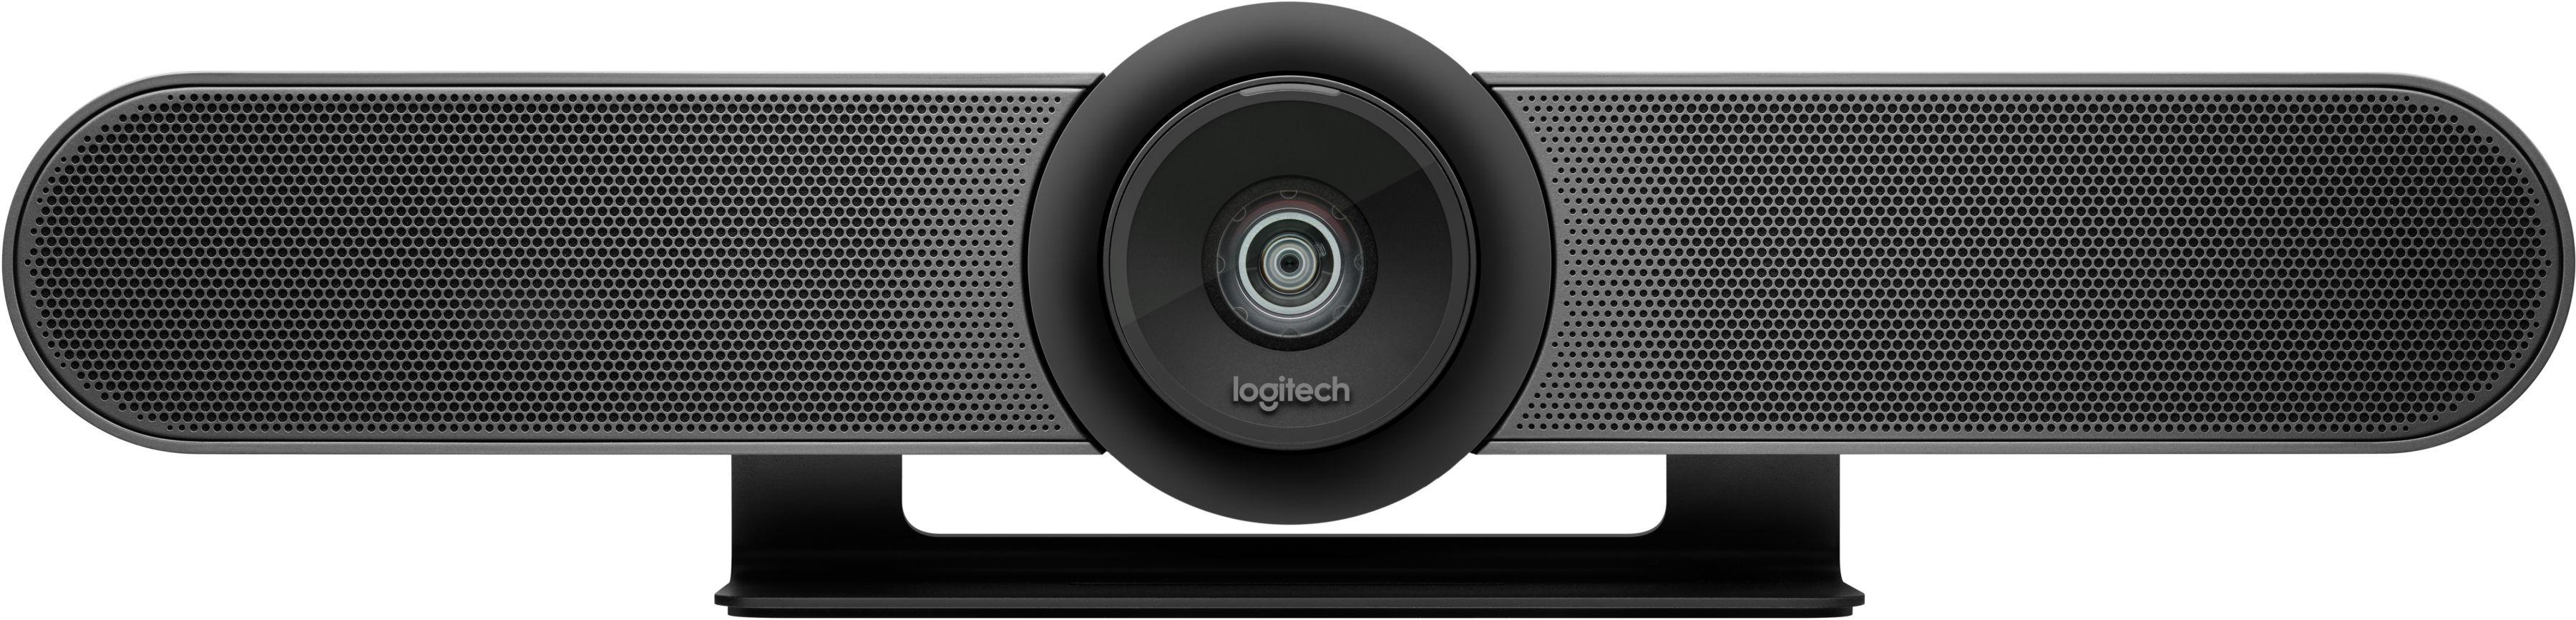 Logitech MeetUp kamera internetowa 3840 x 2160 pixels 30 fps Black